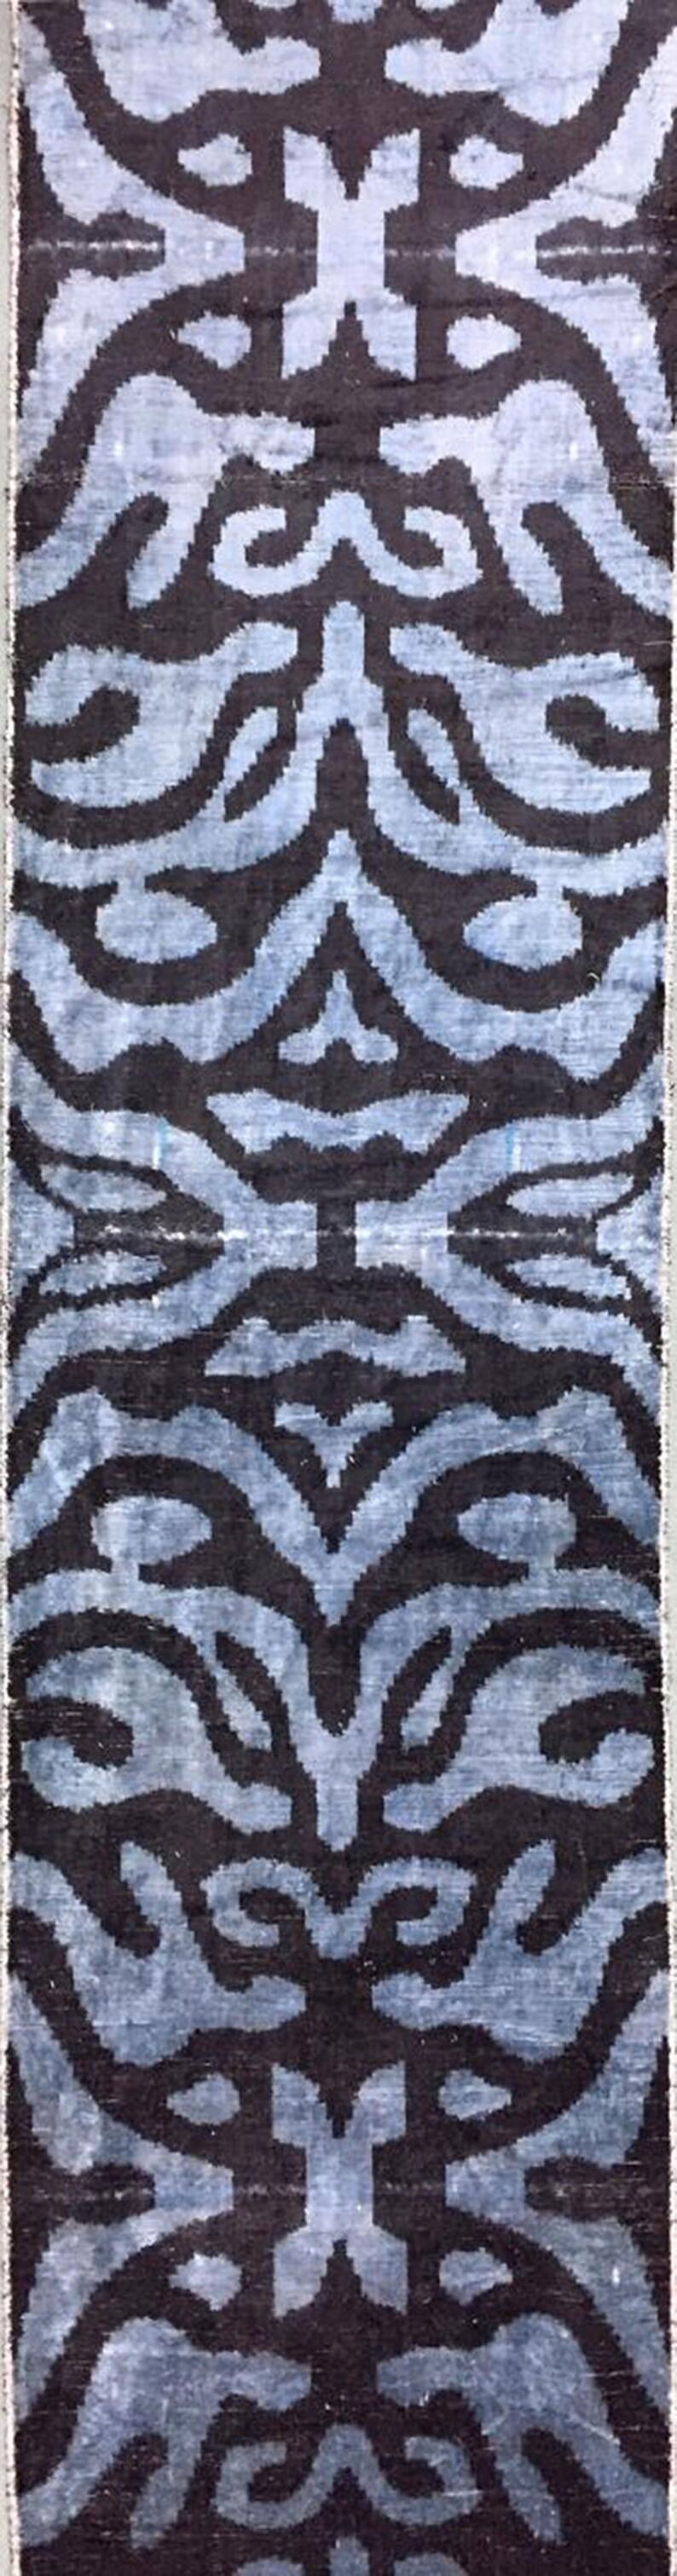 Handmade Ikat velvet fabr\u0131c narrow fabr\u0131c